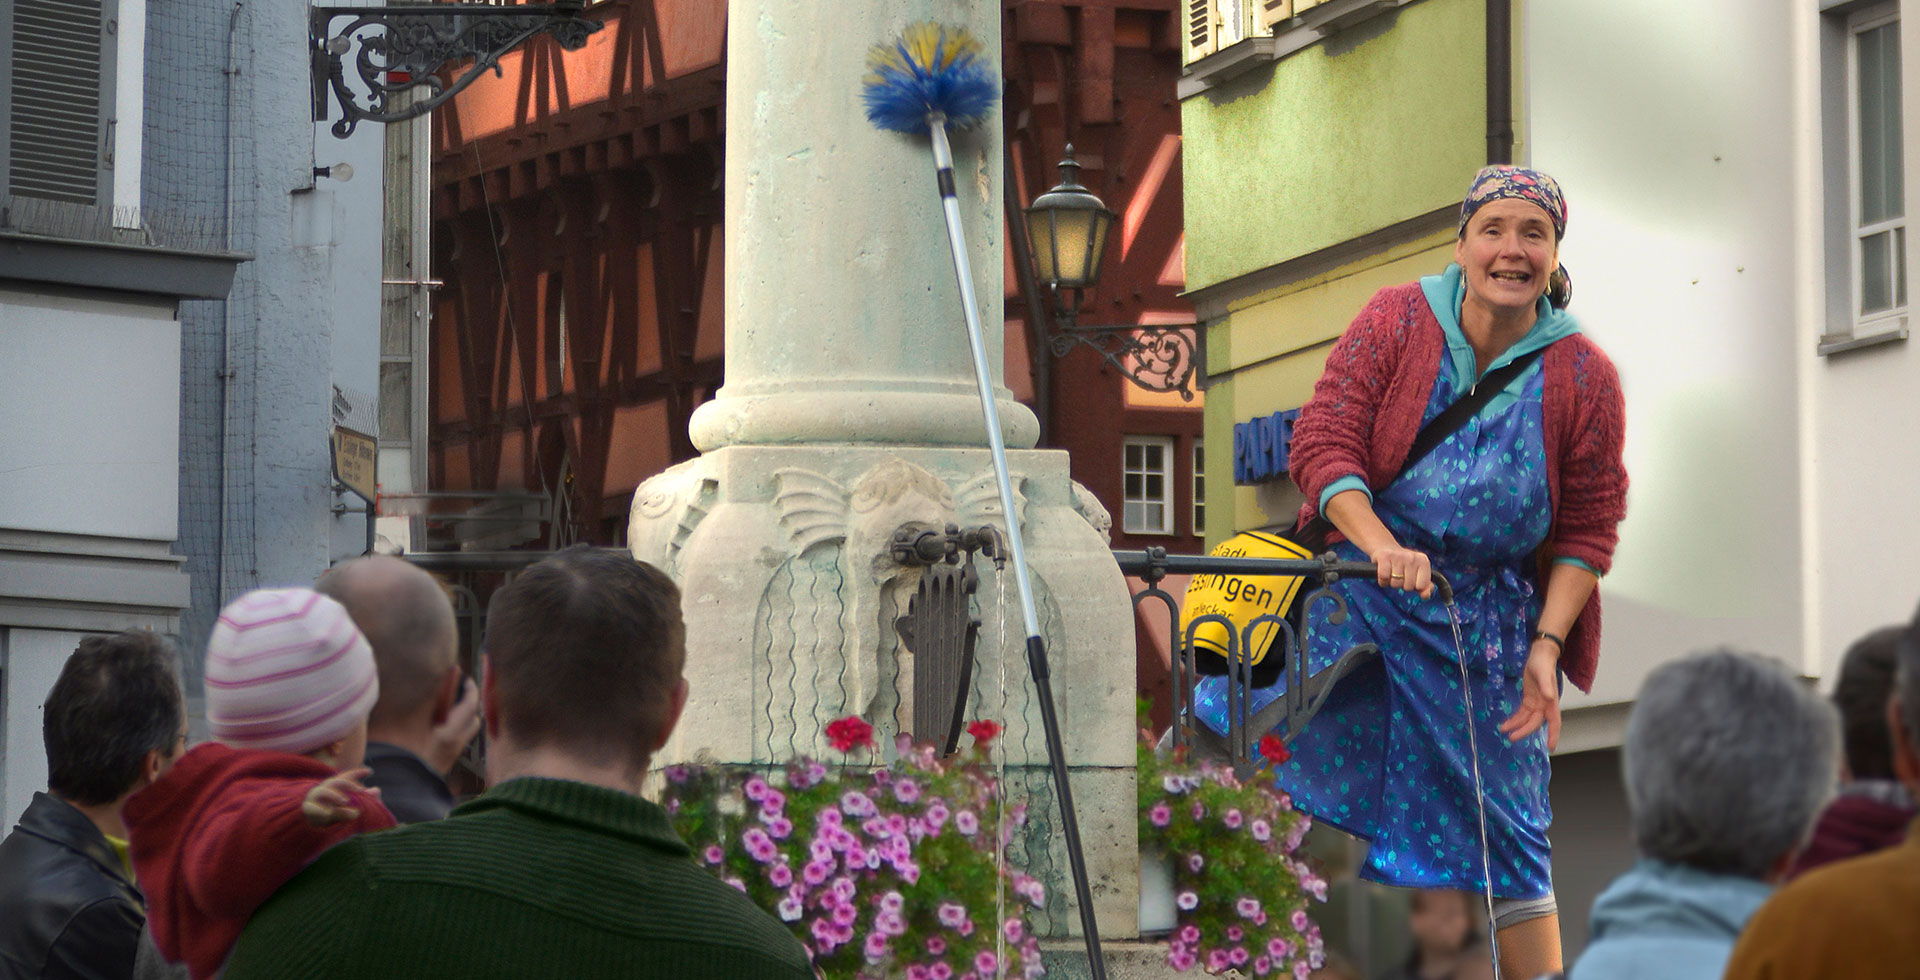 Programm Impression Postmichelbrunnen - ERNA ORIGINAL – Der Theaterspaziergang in Esslingen